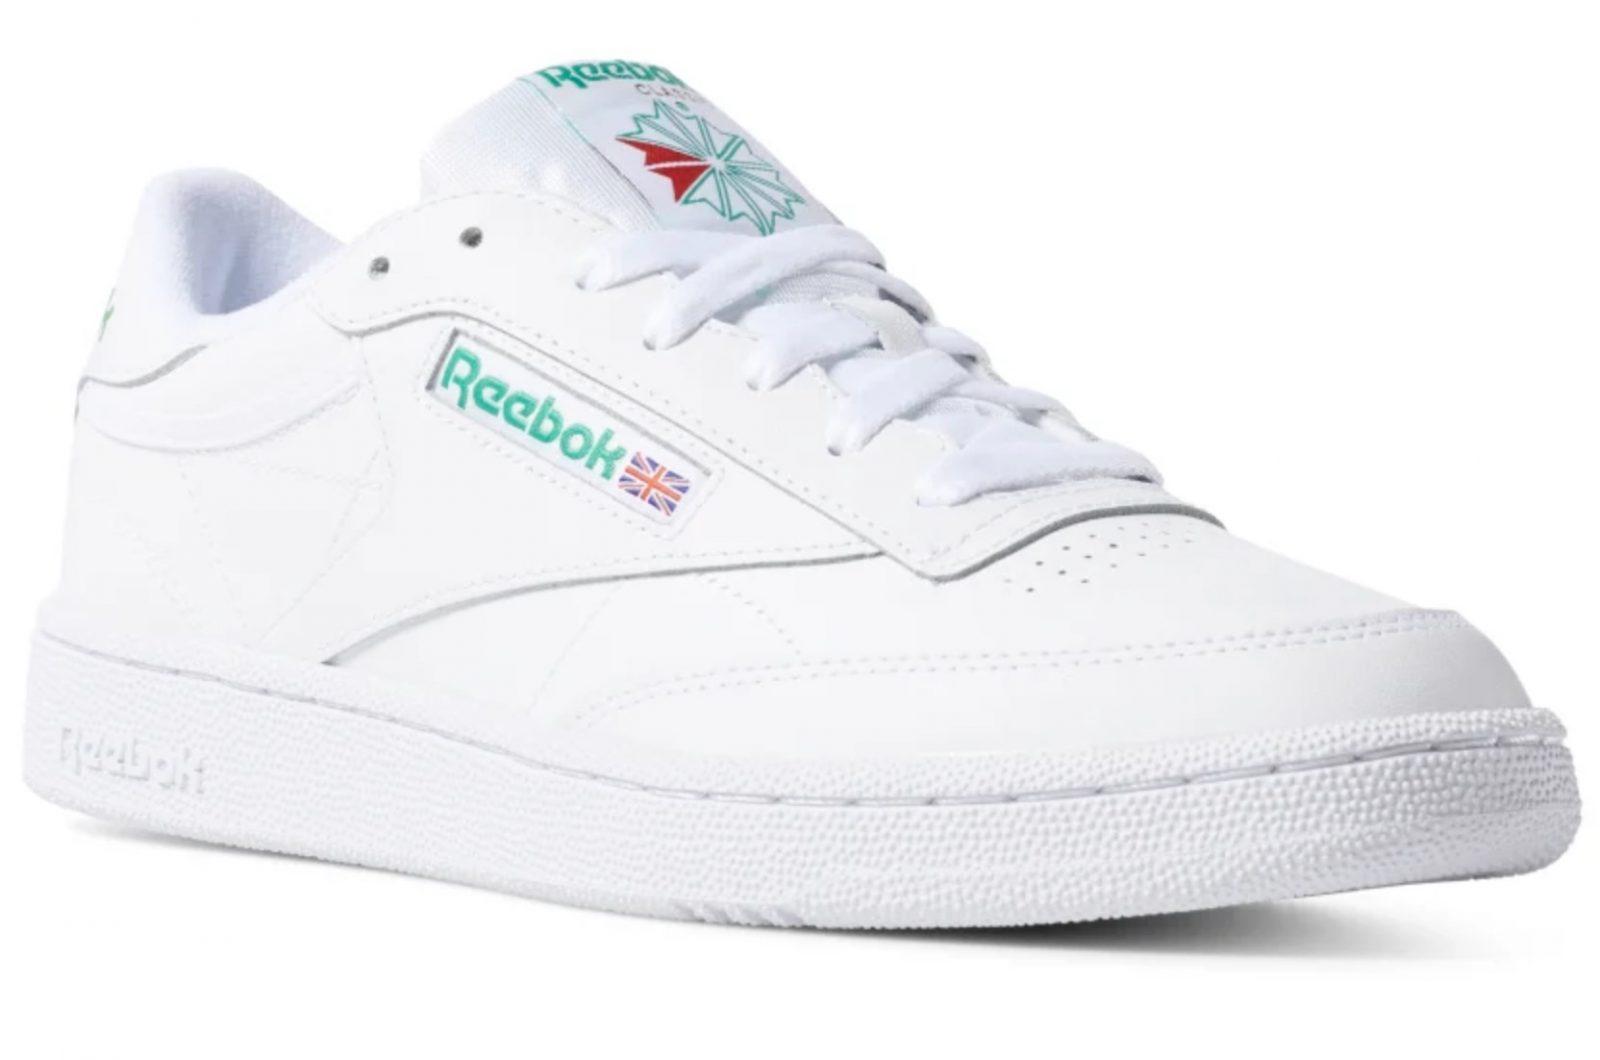 Reebok Club C 85 White Green | AR0456